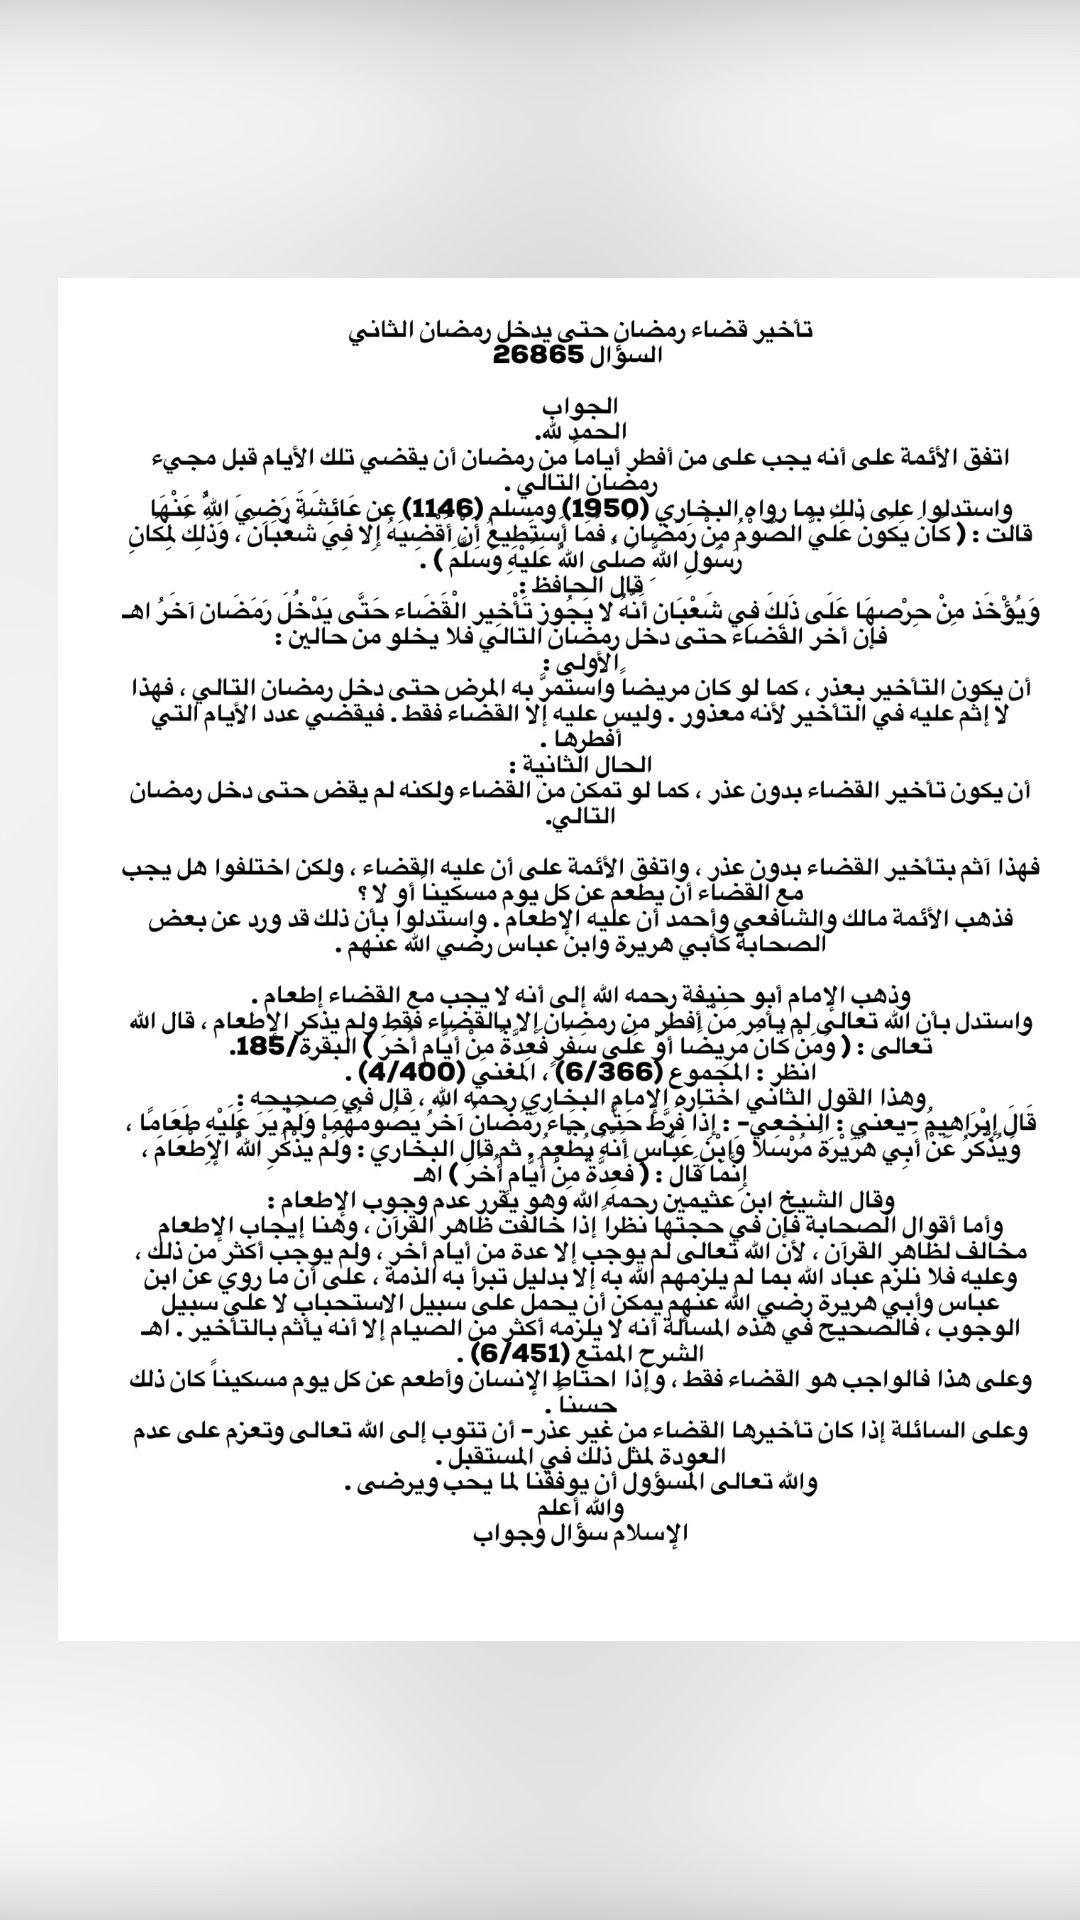 تأخير قضاء رمضان حتى يدخل رمضان الثاني 26865 An Immersive Guide By اترك اثرا علي المنبهي